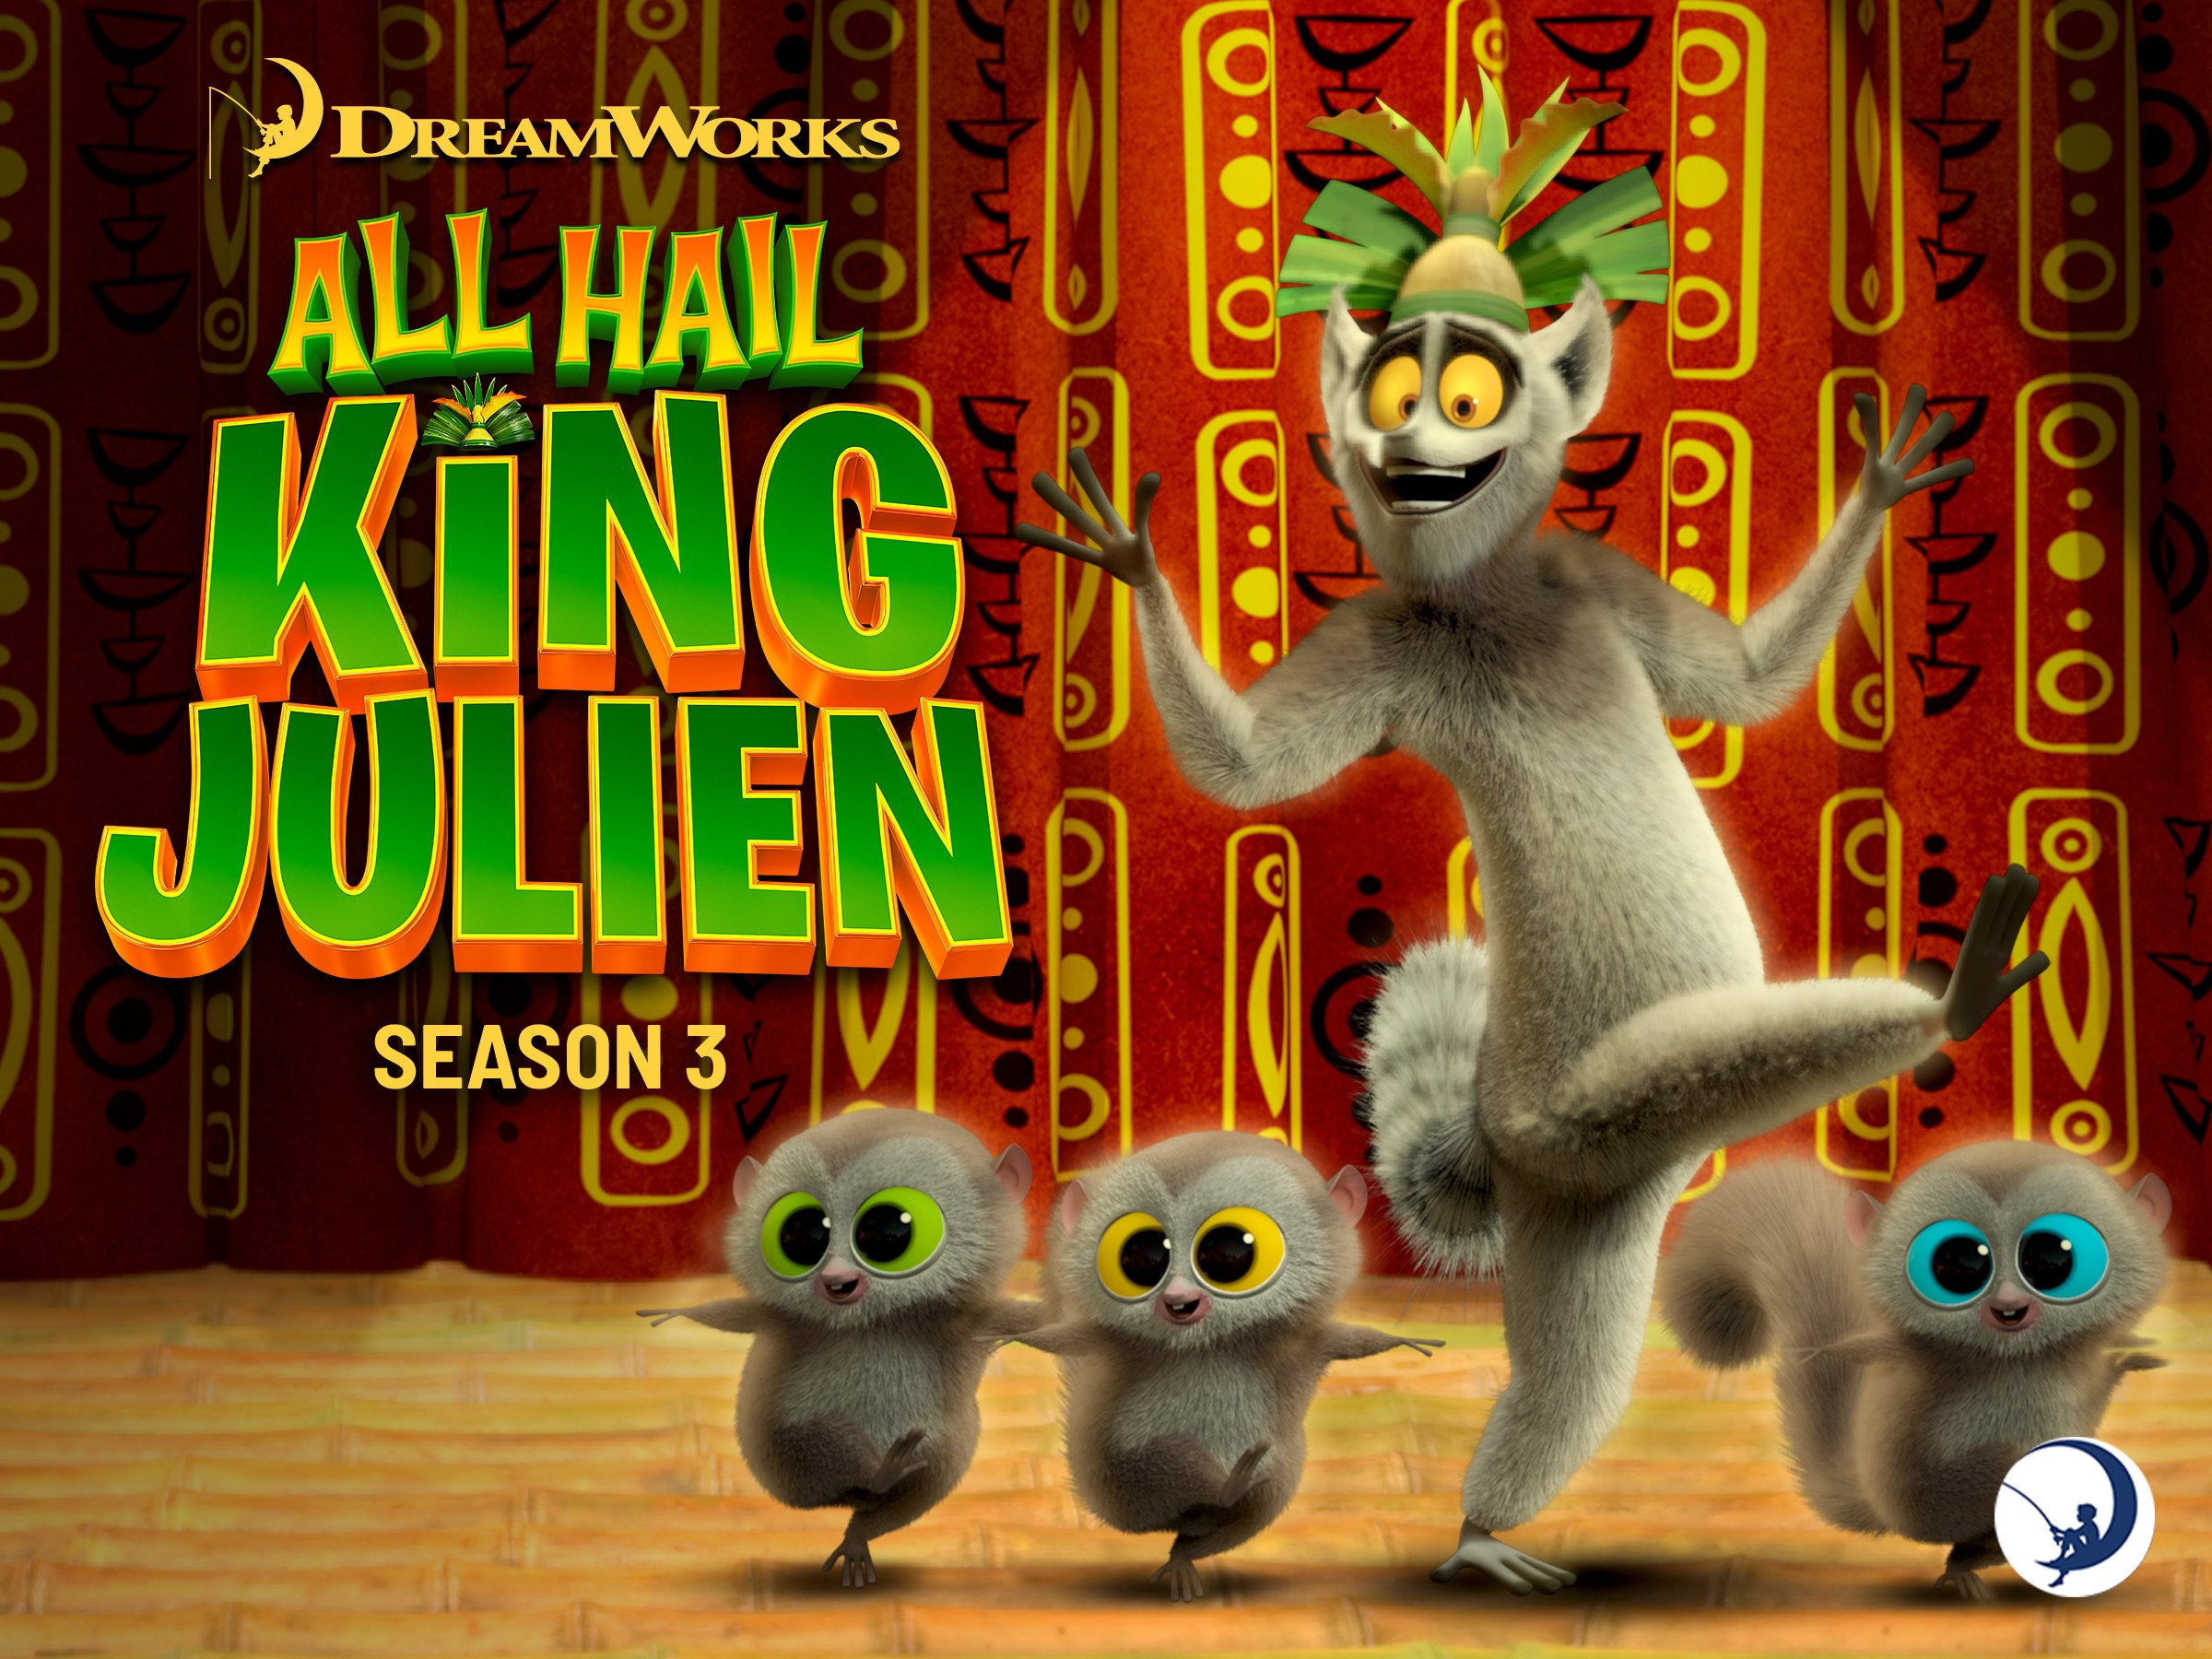 all hail king julien season 5 episode 1